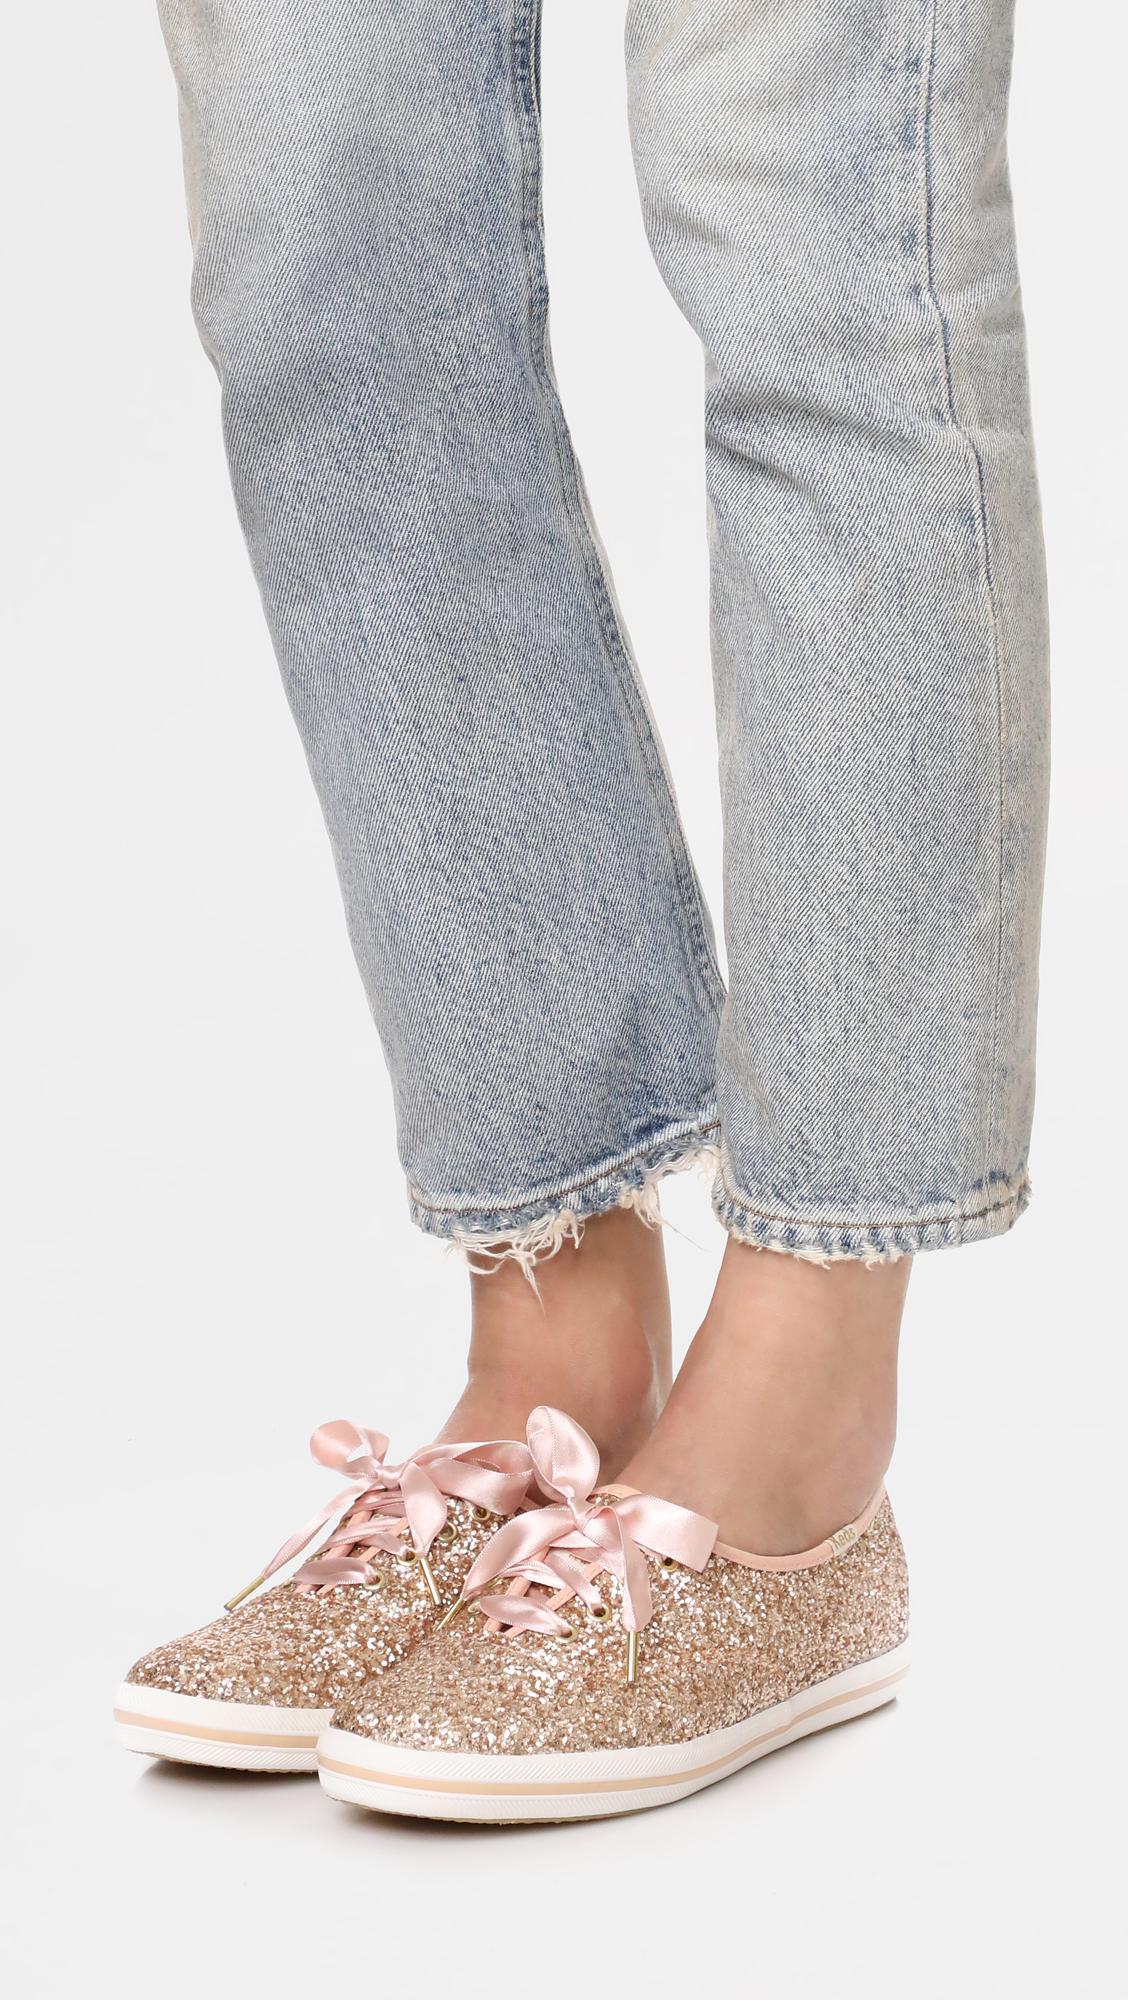 f4fbc4400358 Keds - Pink X Kate Spade New York Glitter Sneakers - Lyst. View fullscreen